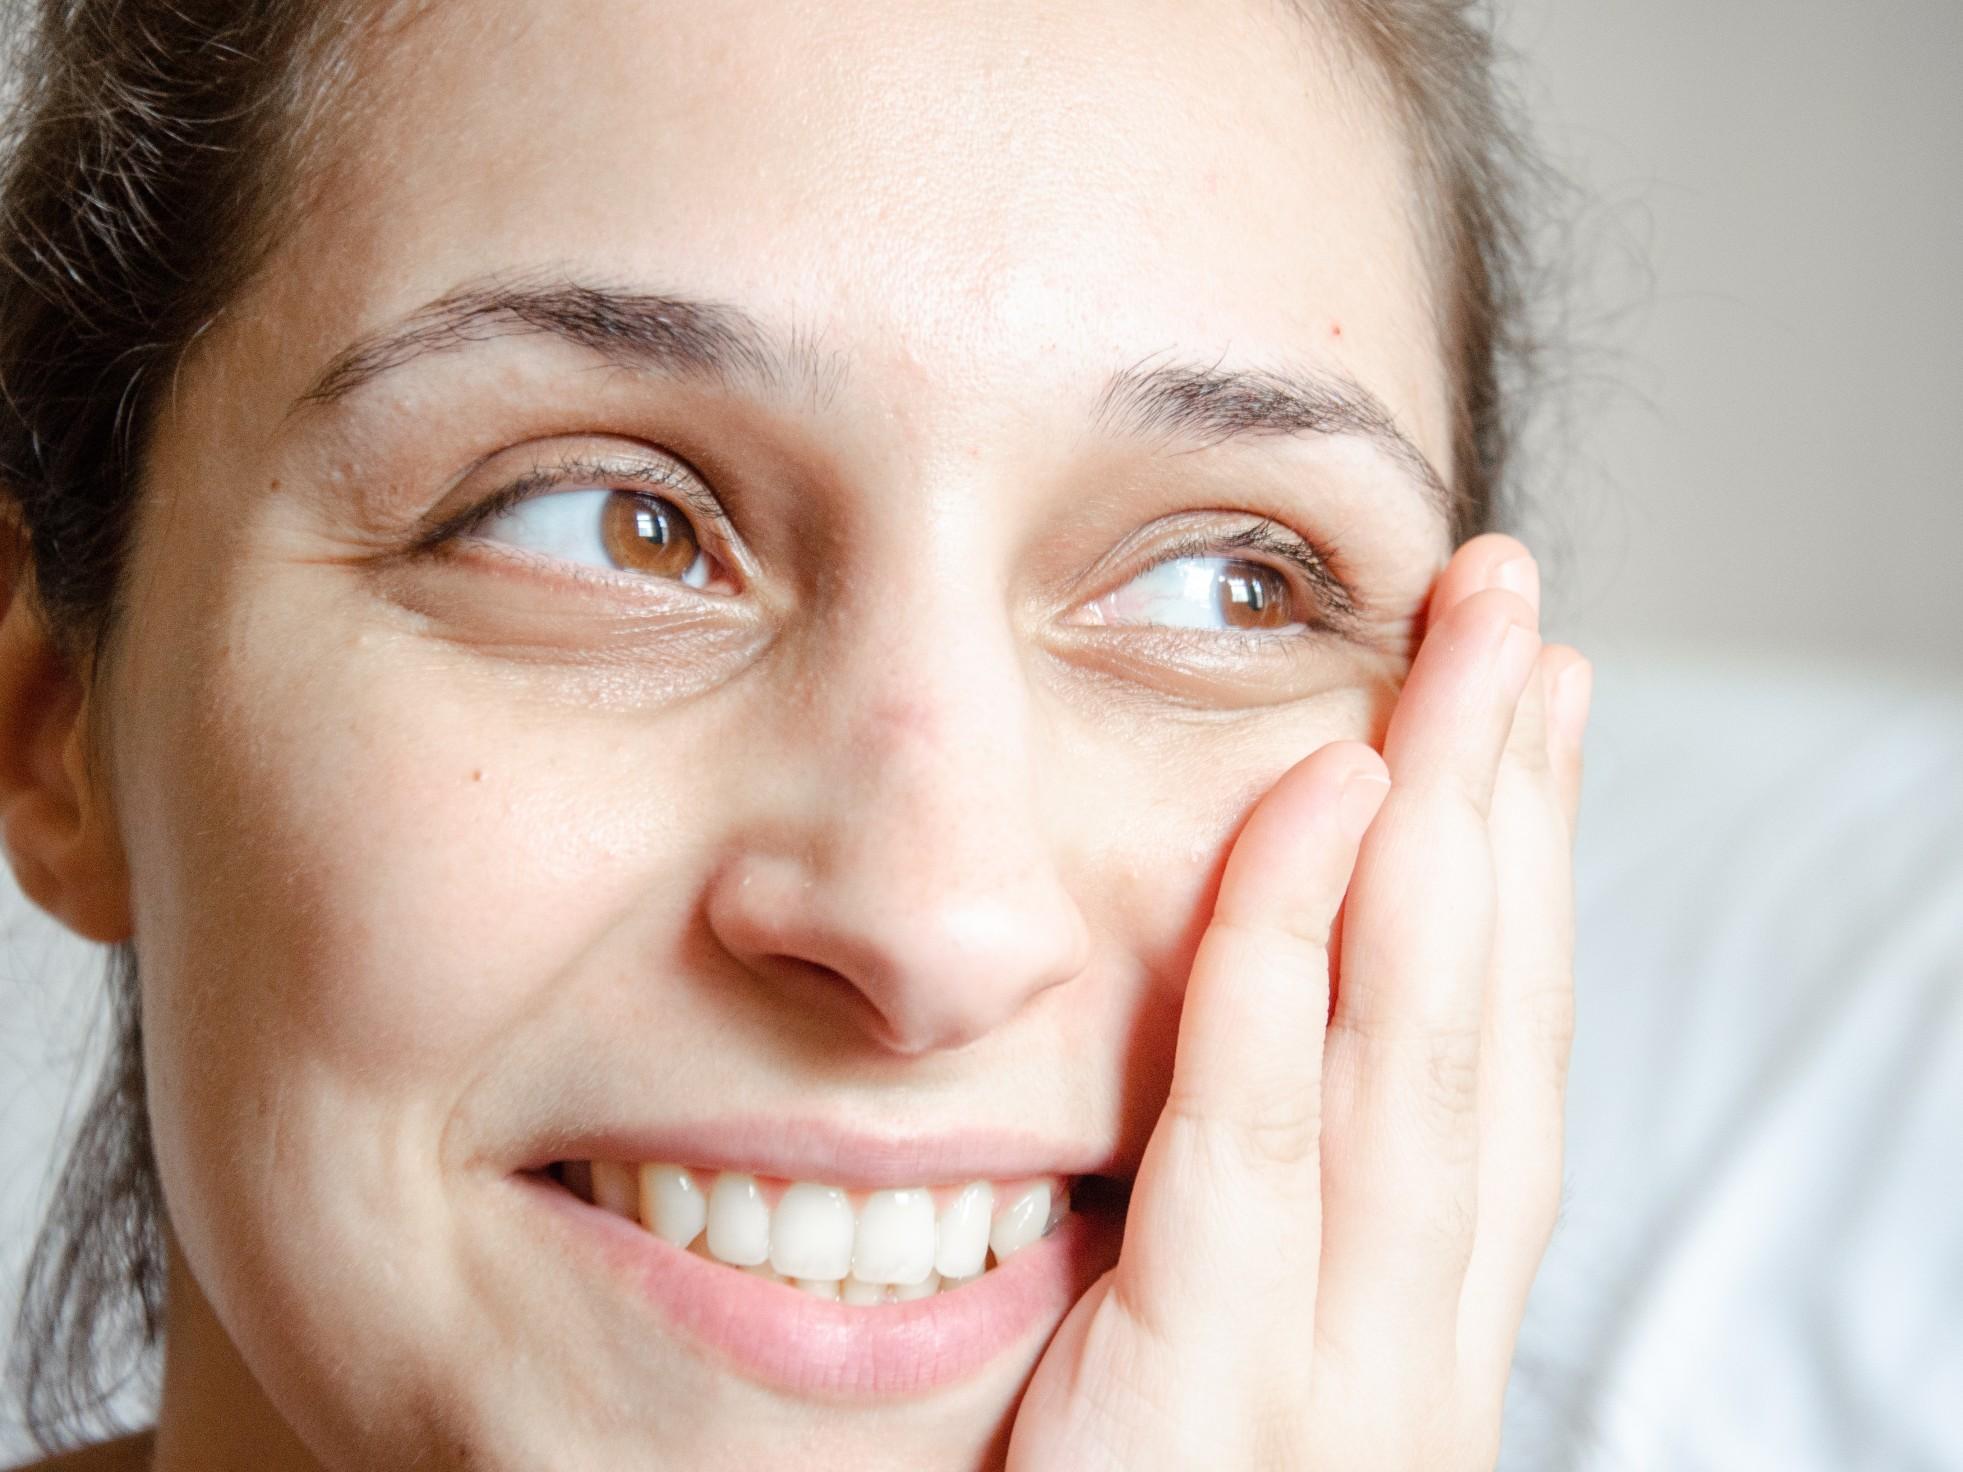 opalescence teeth system